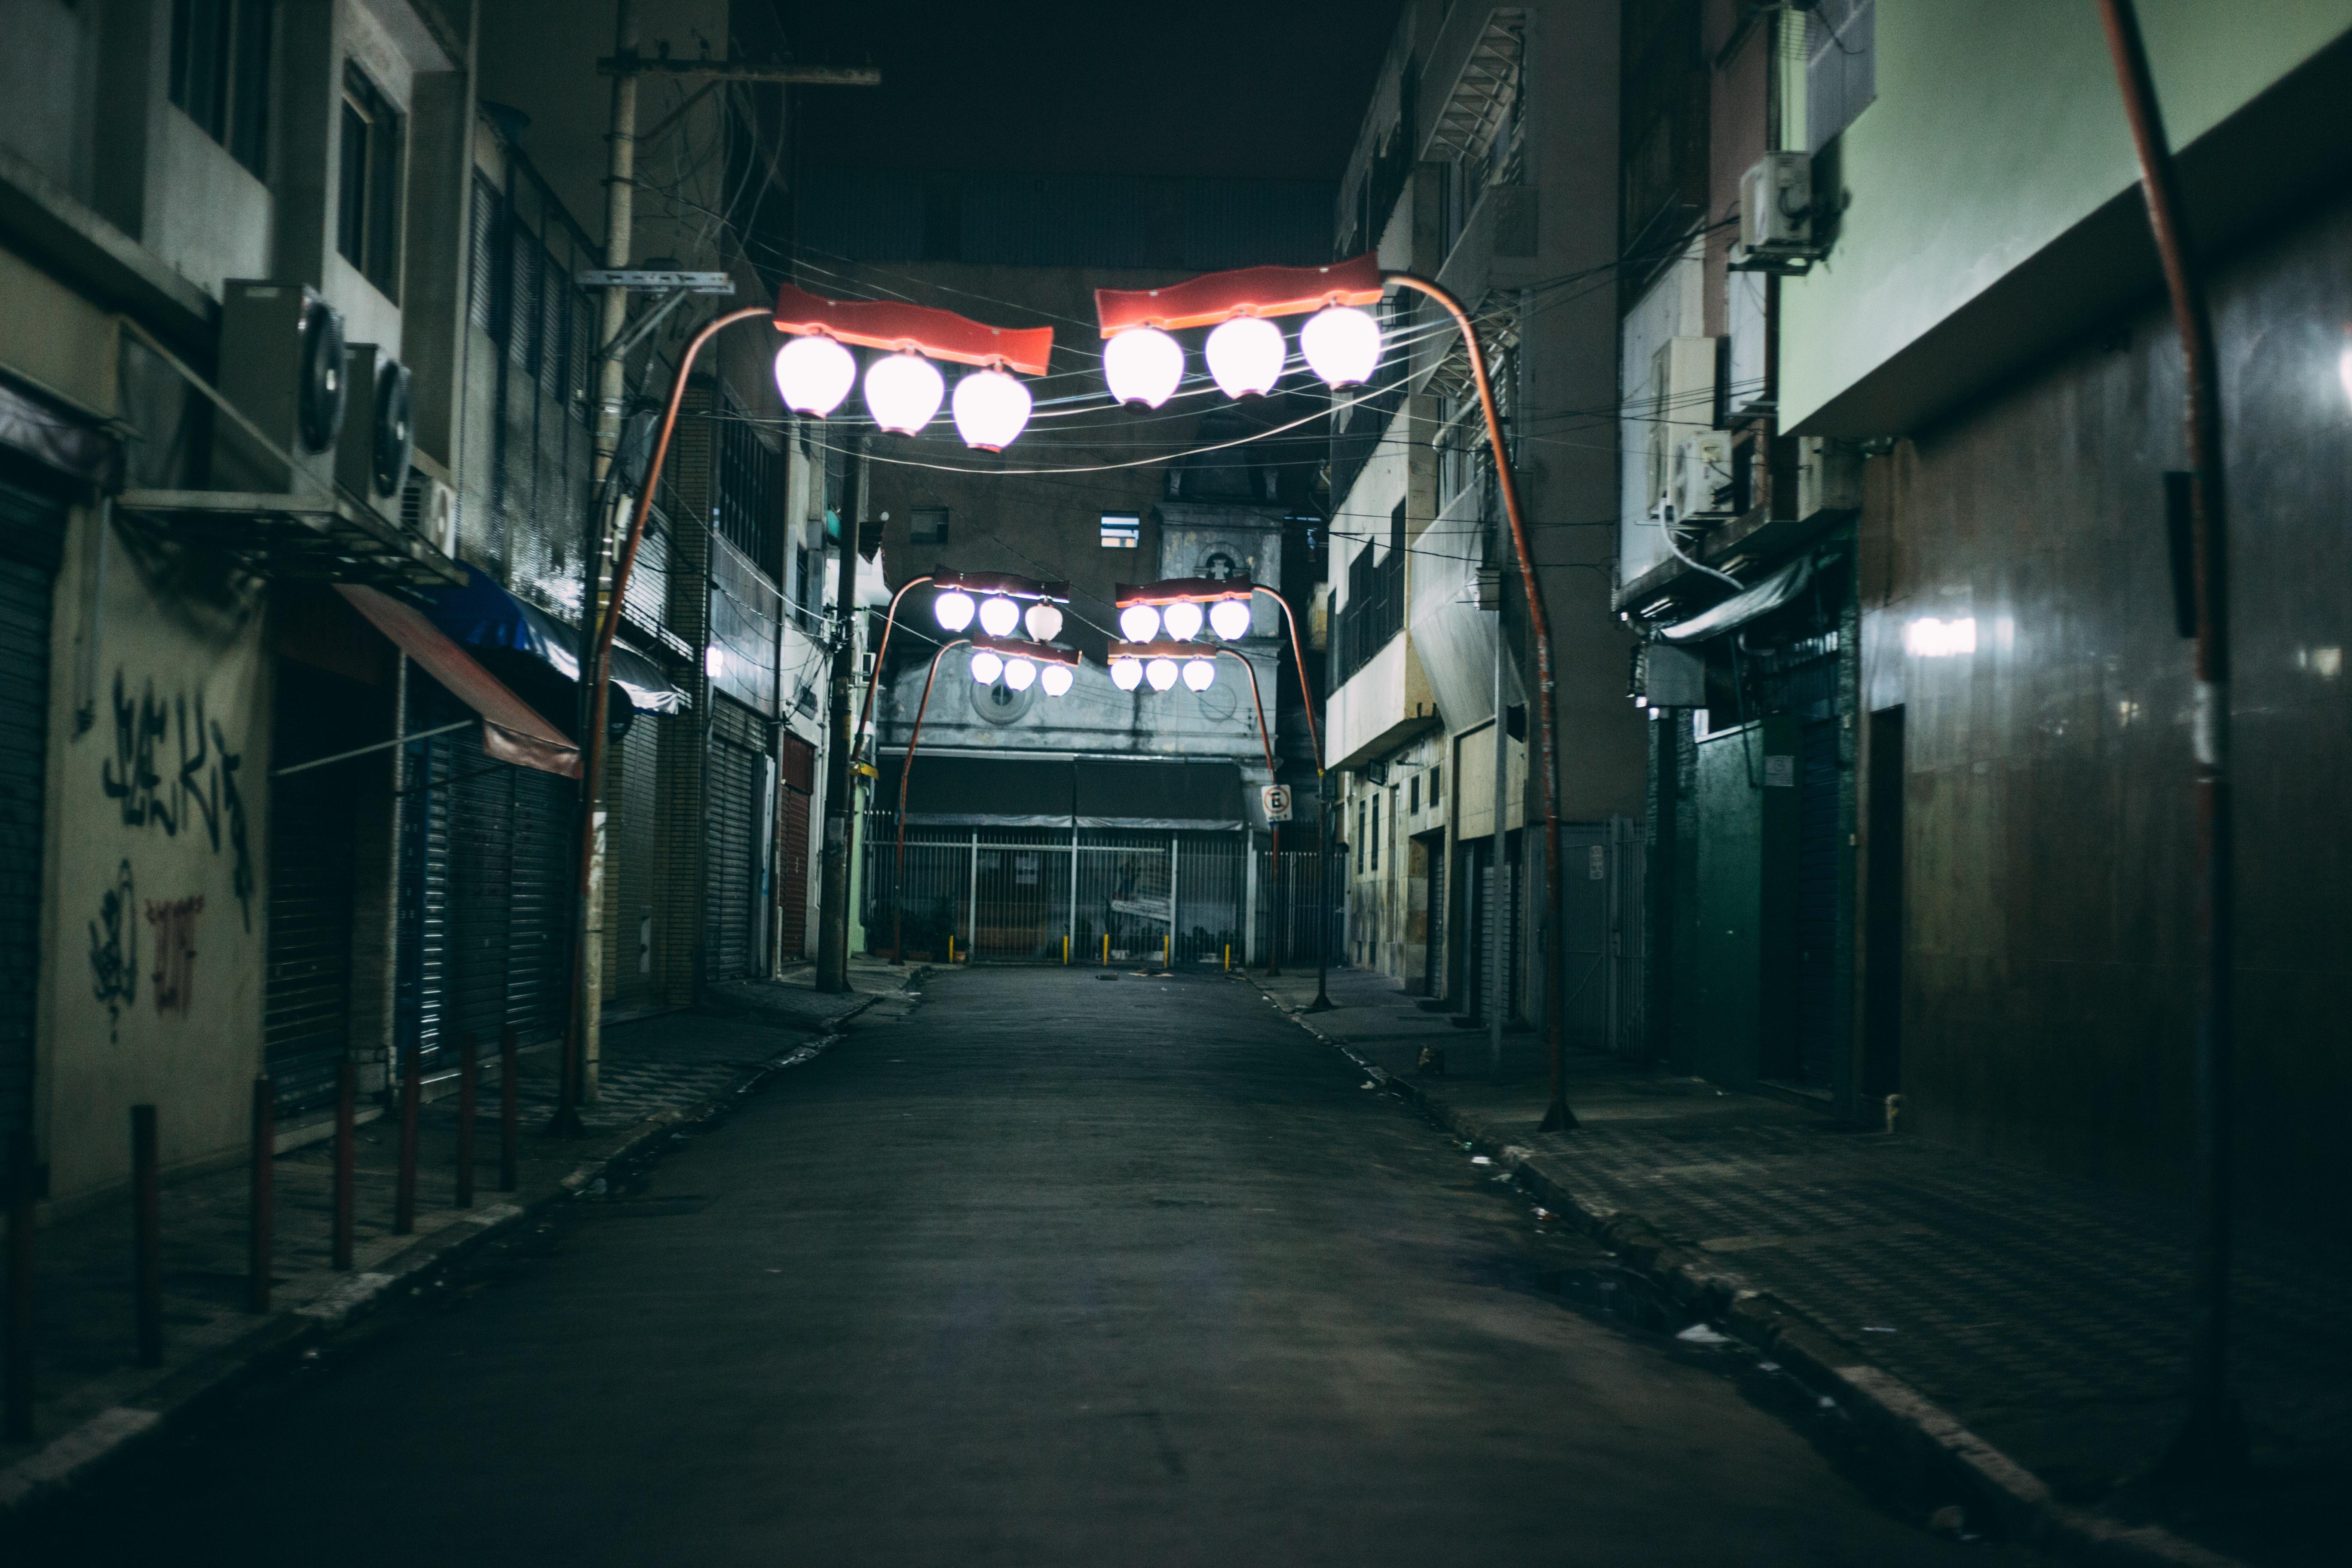 alley-city-lights-50859.jpg